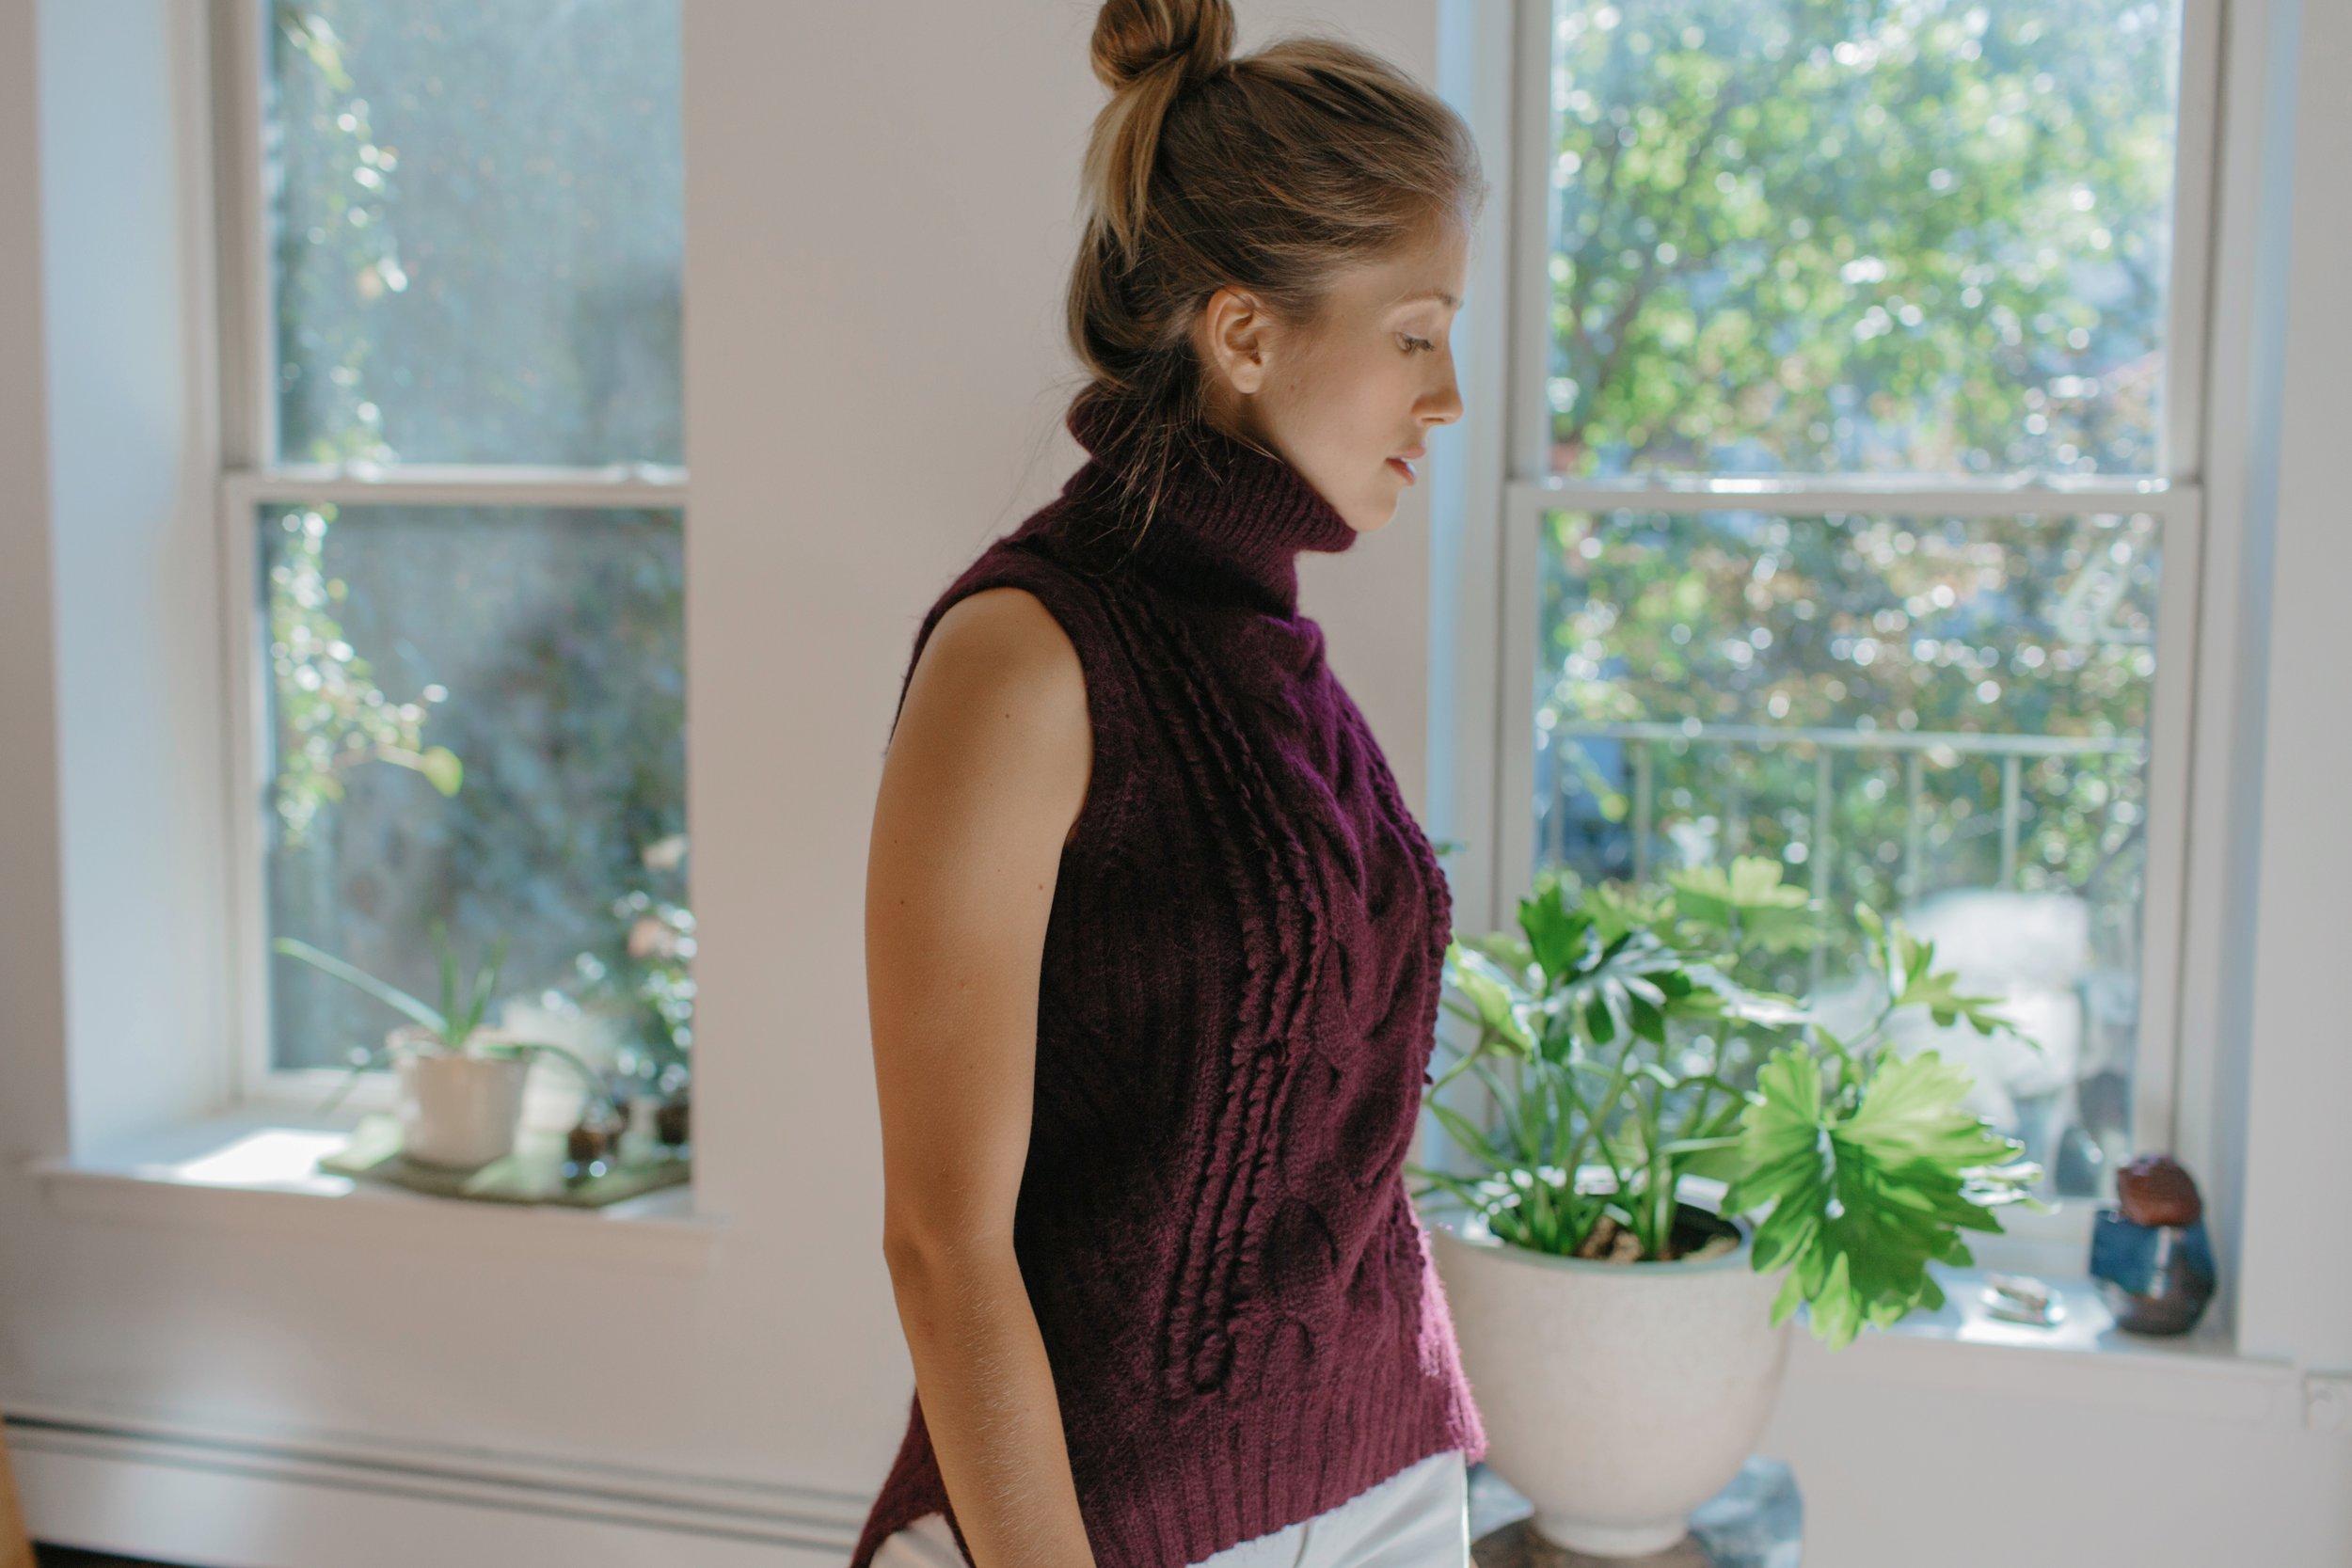 Jenna wears  Sofia sweater  in Bordeaux | Made in super, soft alpaca-blend yarn hand-knit by Peruvian artisan women,with LOVE